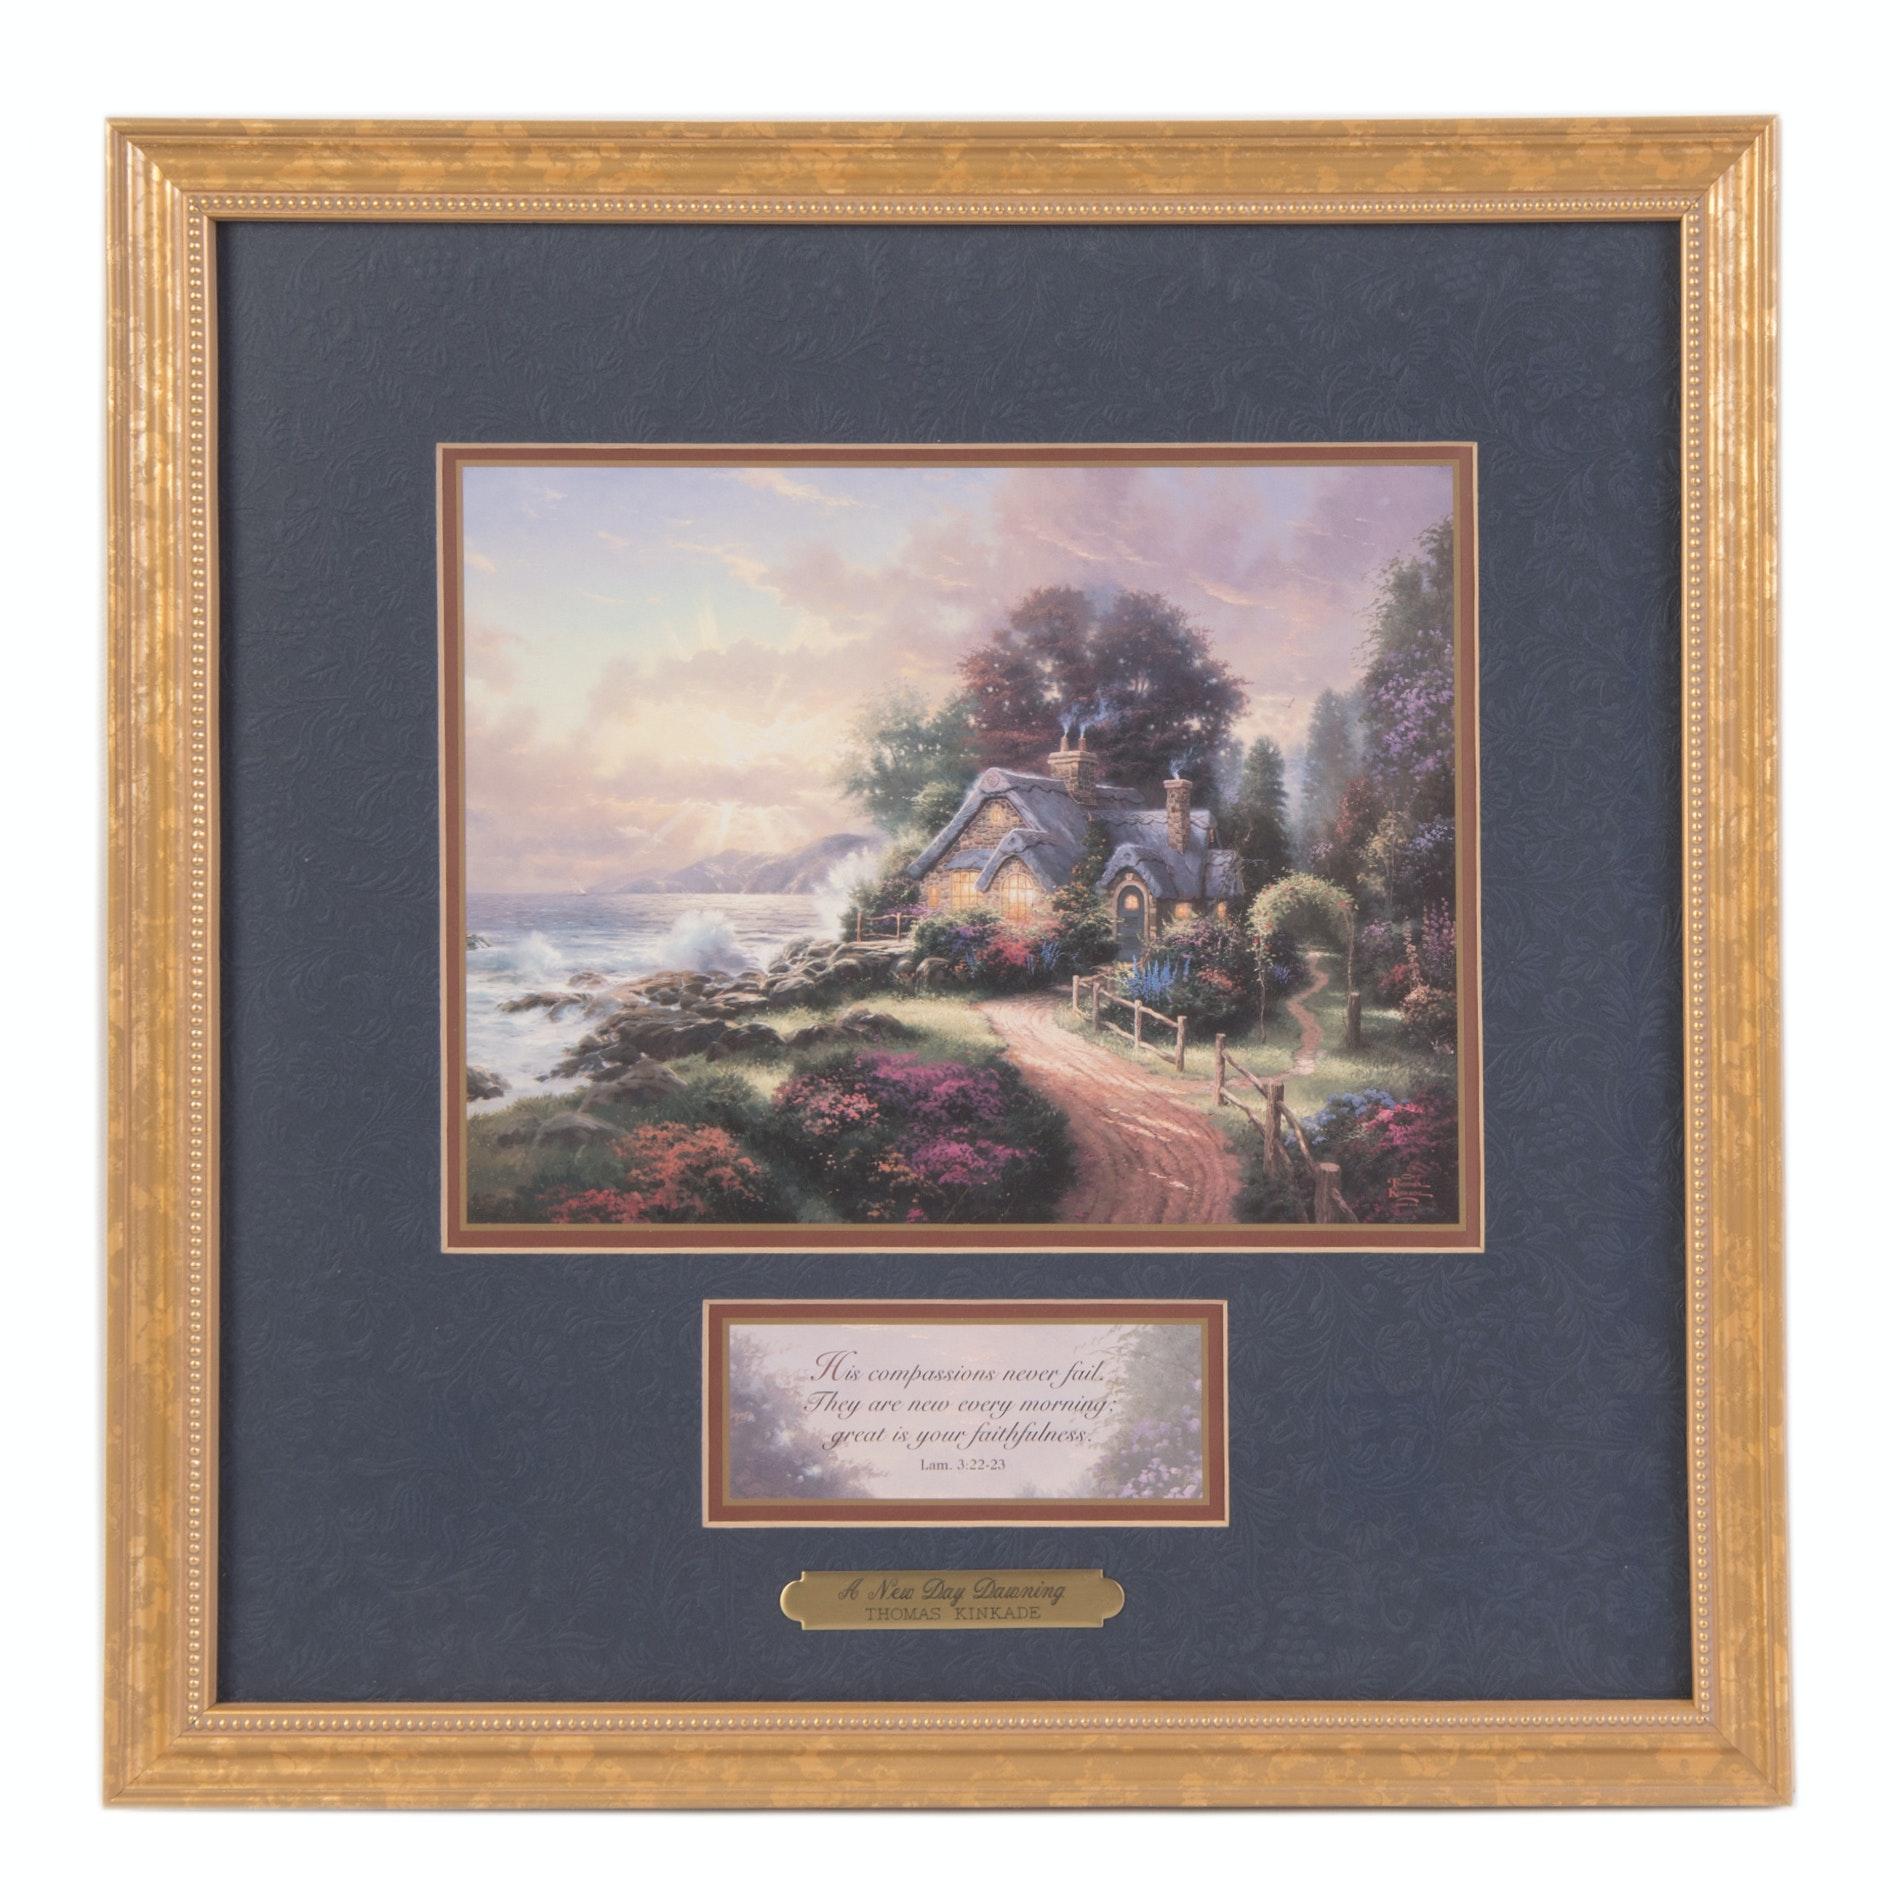 Thomas Kinkade Framed Lithograph